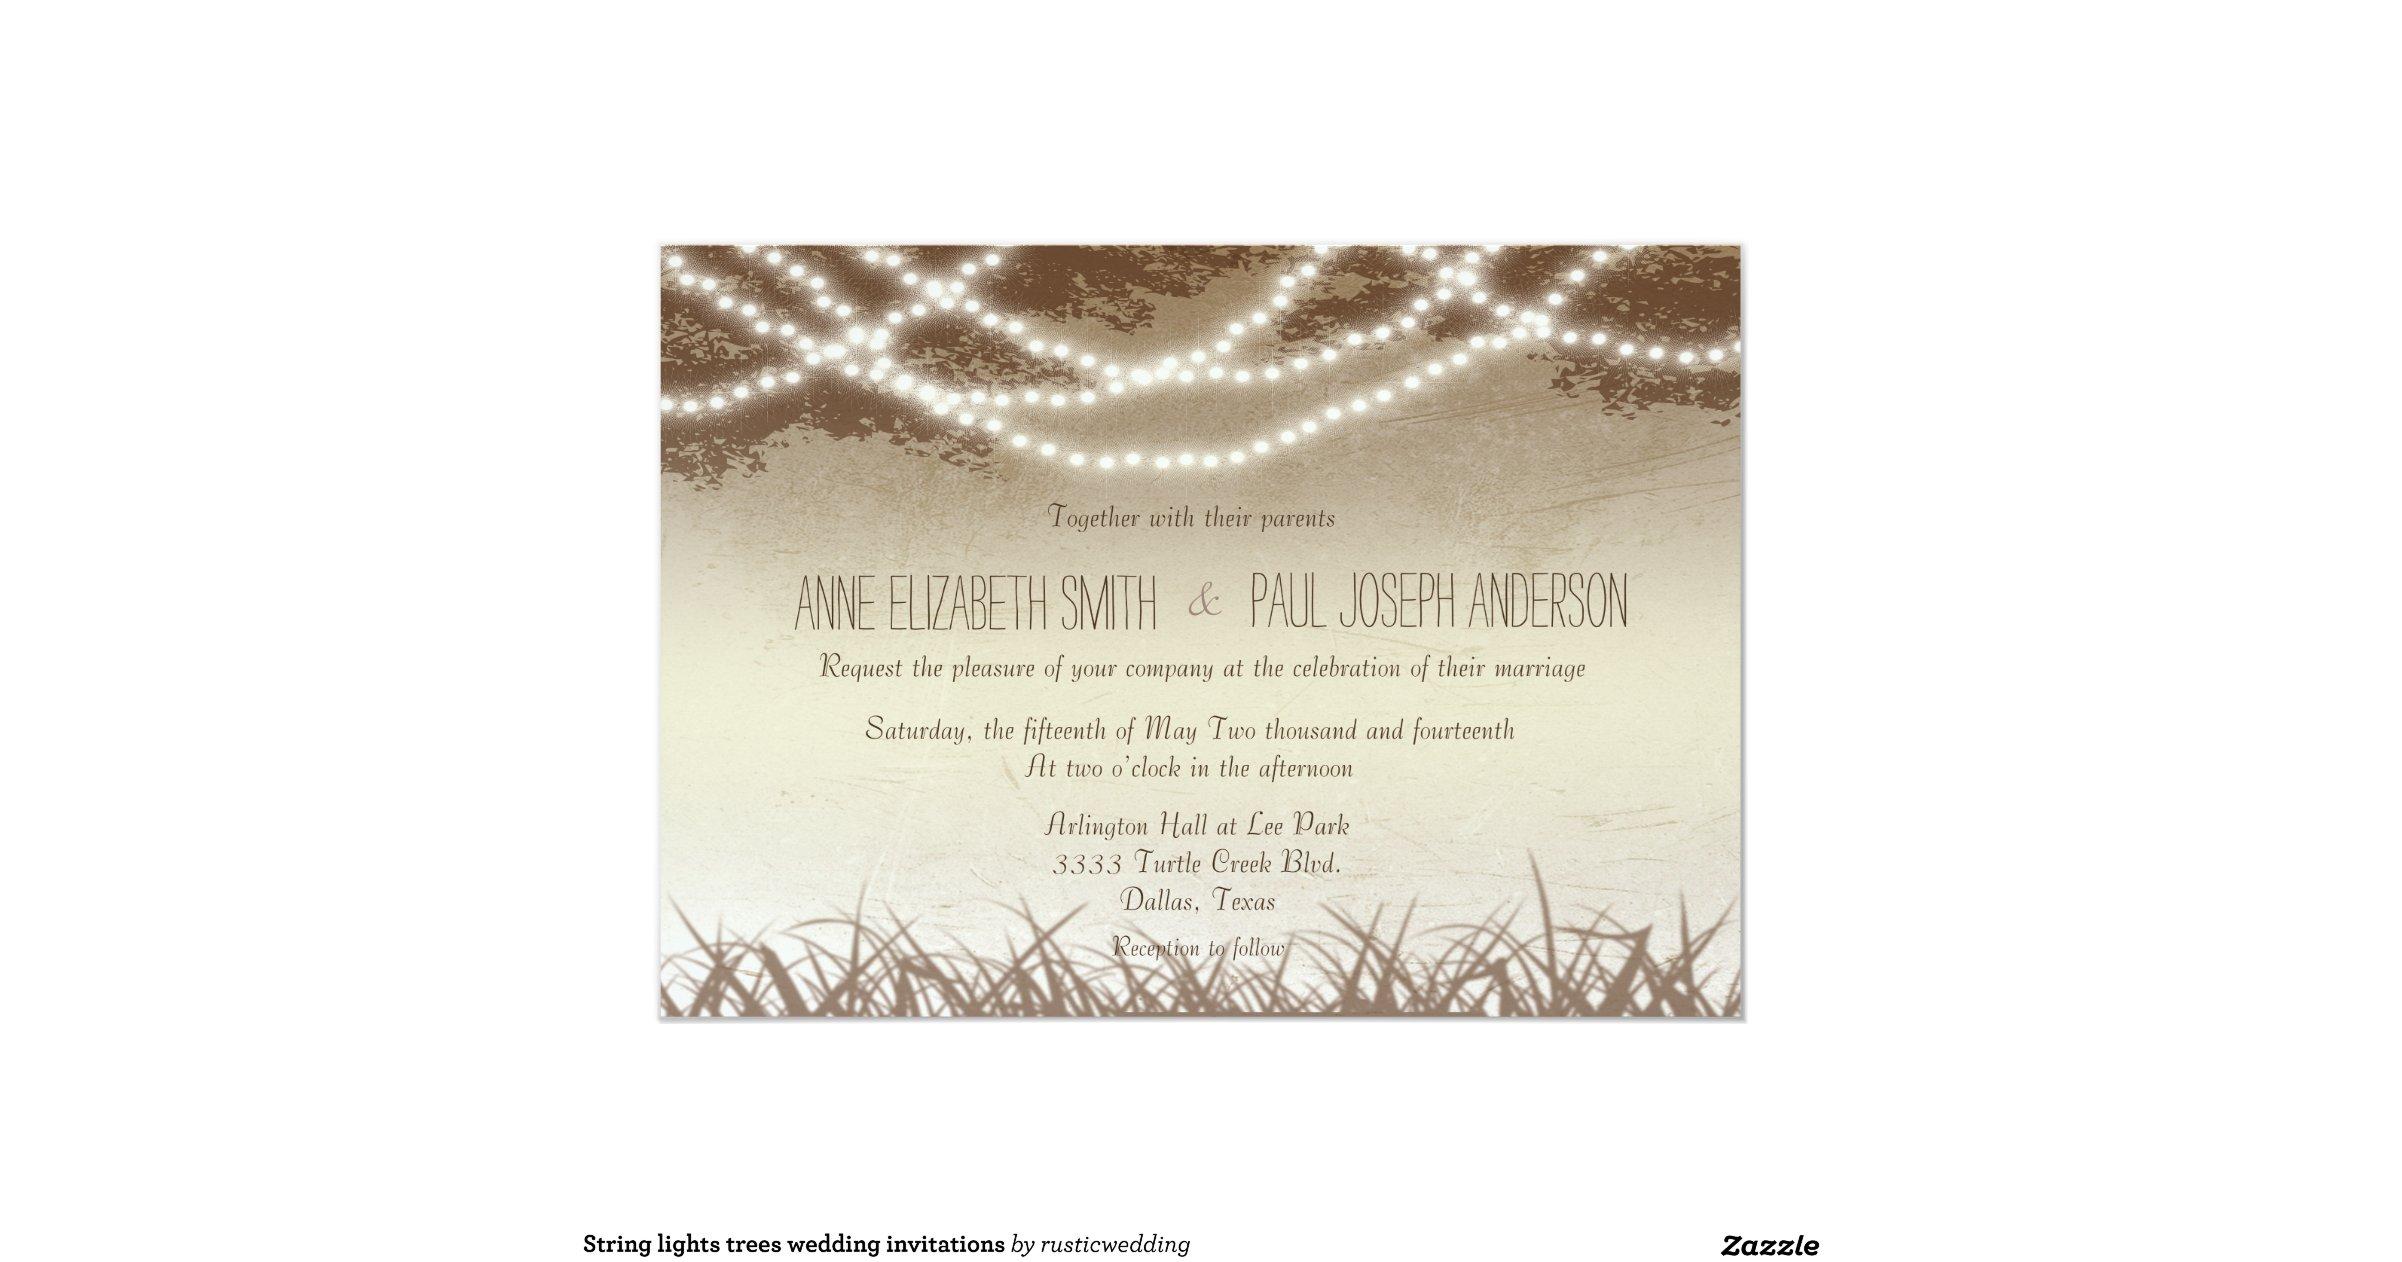 String Lights Wedding Invitation : string_lights_trees_wedding_invitations-rf03b5986d9dc4636835bed09e80b0c5b_zkrqs_1200.jpg?rlvnet ...